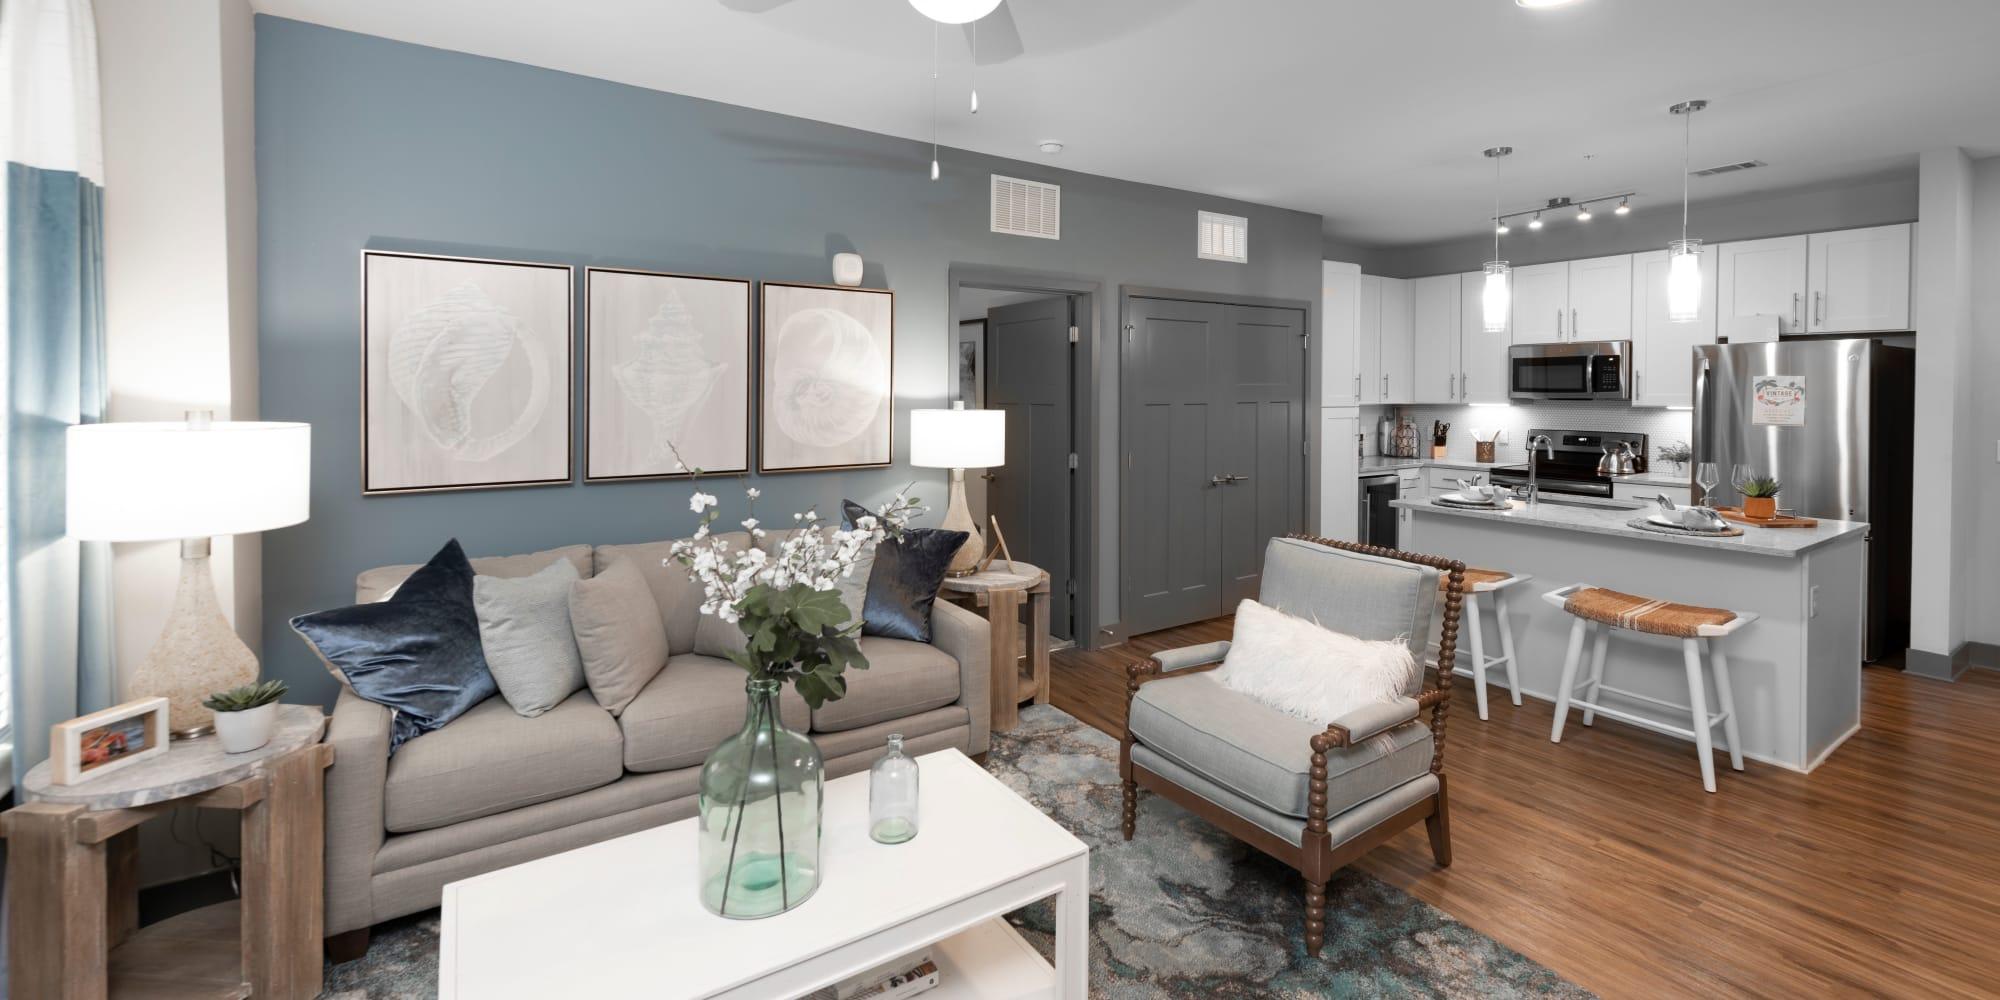 Spacious Apartments at Olympus Emerald Coast in Destin, Florida